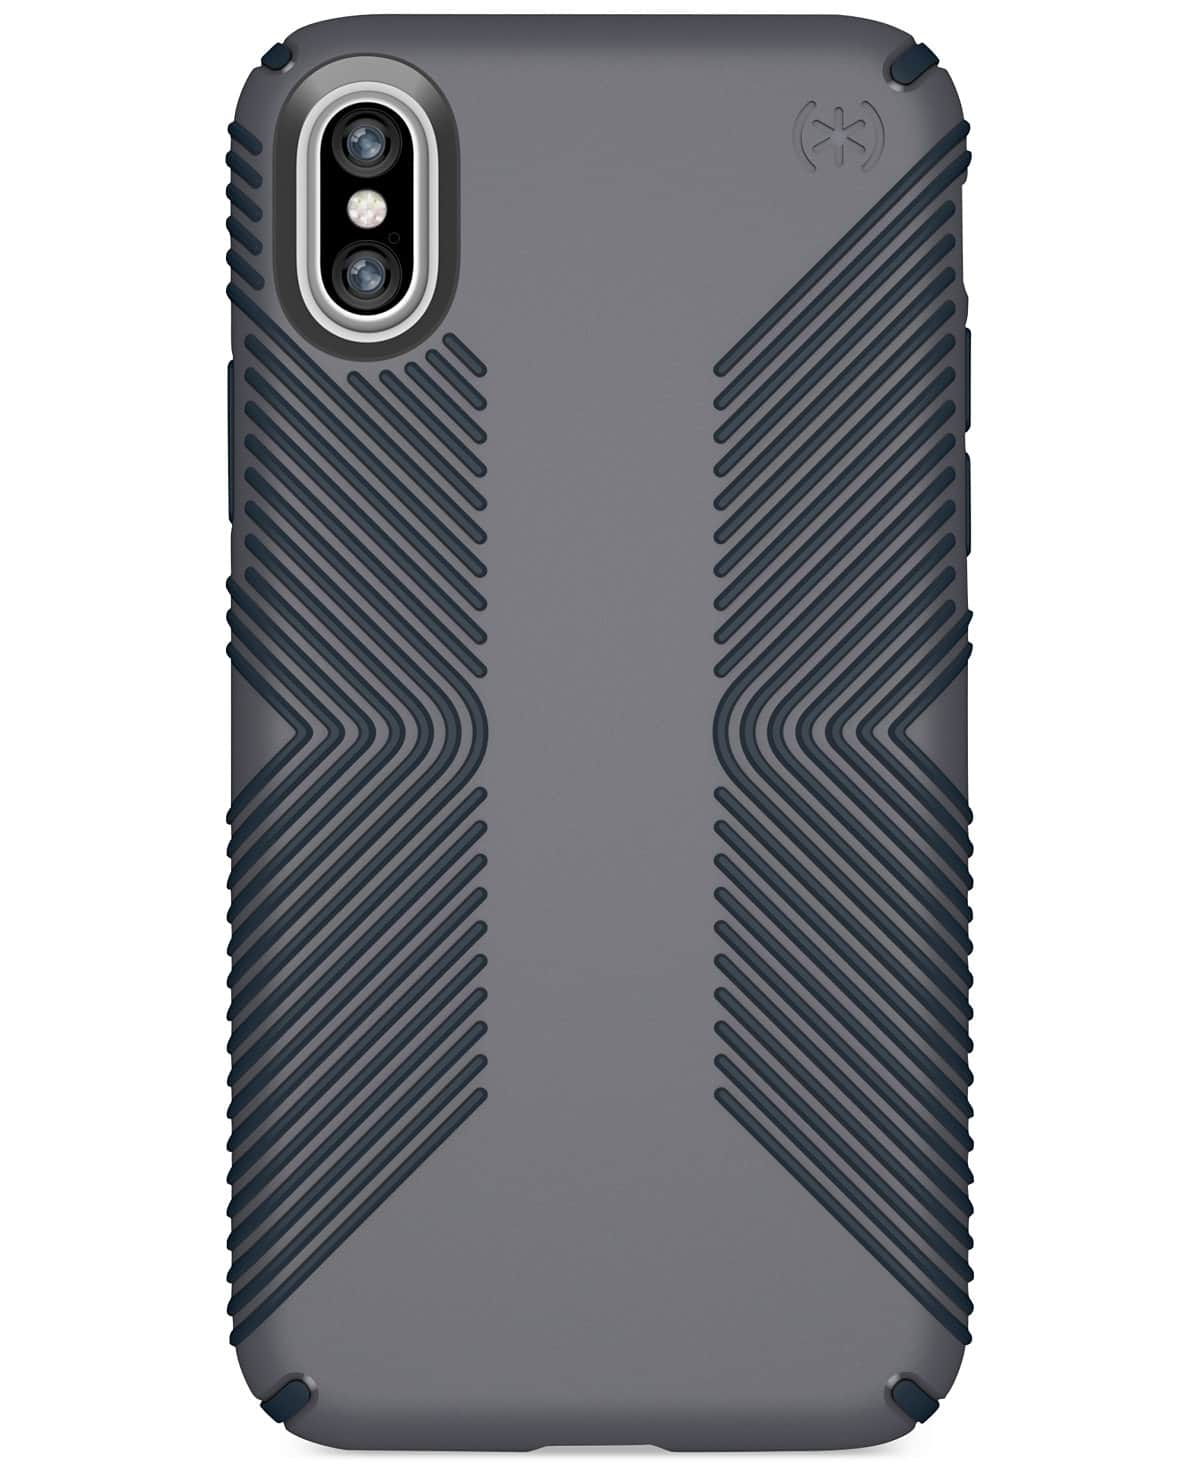 Speck Presidio Grip Case - iPhone X $23.99 (was $39.95)